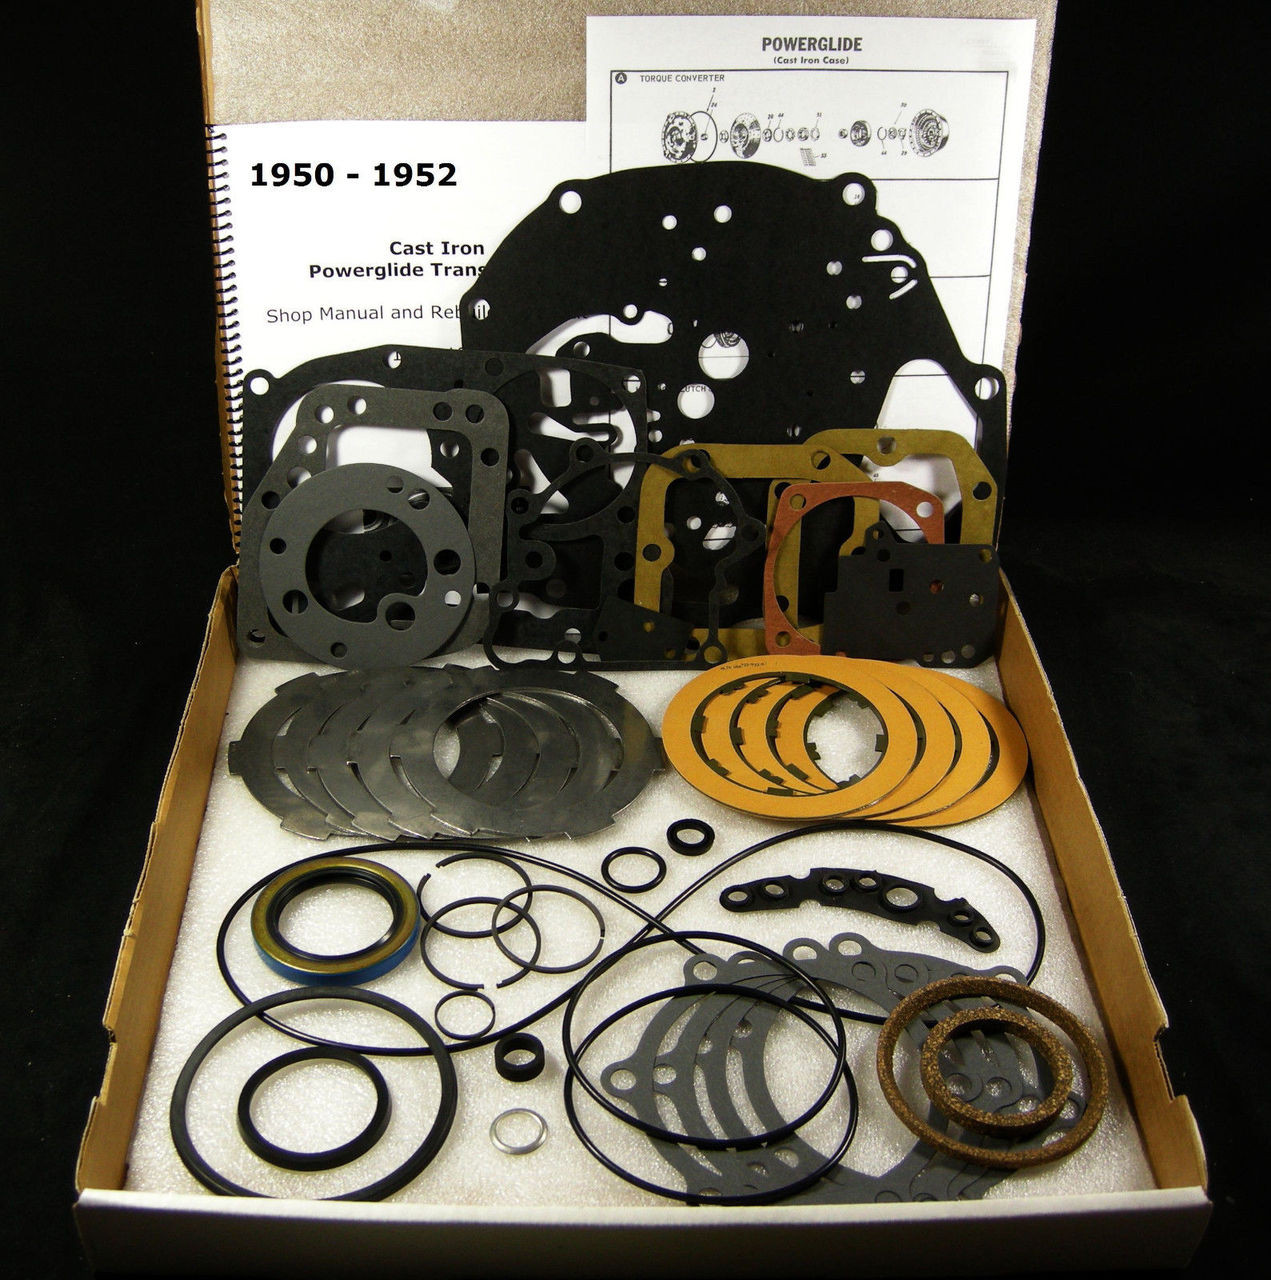 medium resolution of 950 52 cast iron powerglide transmission rebuild overhaul part kit